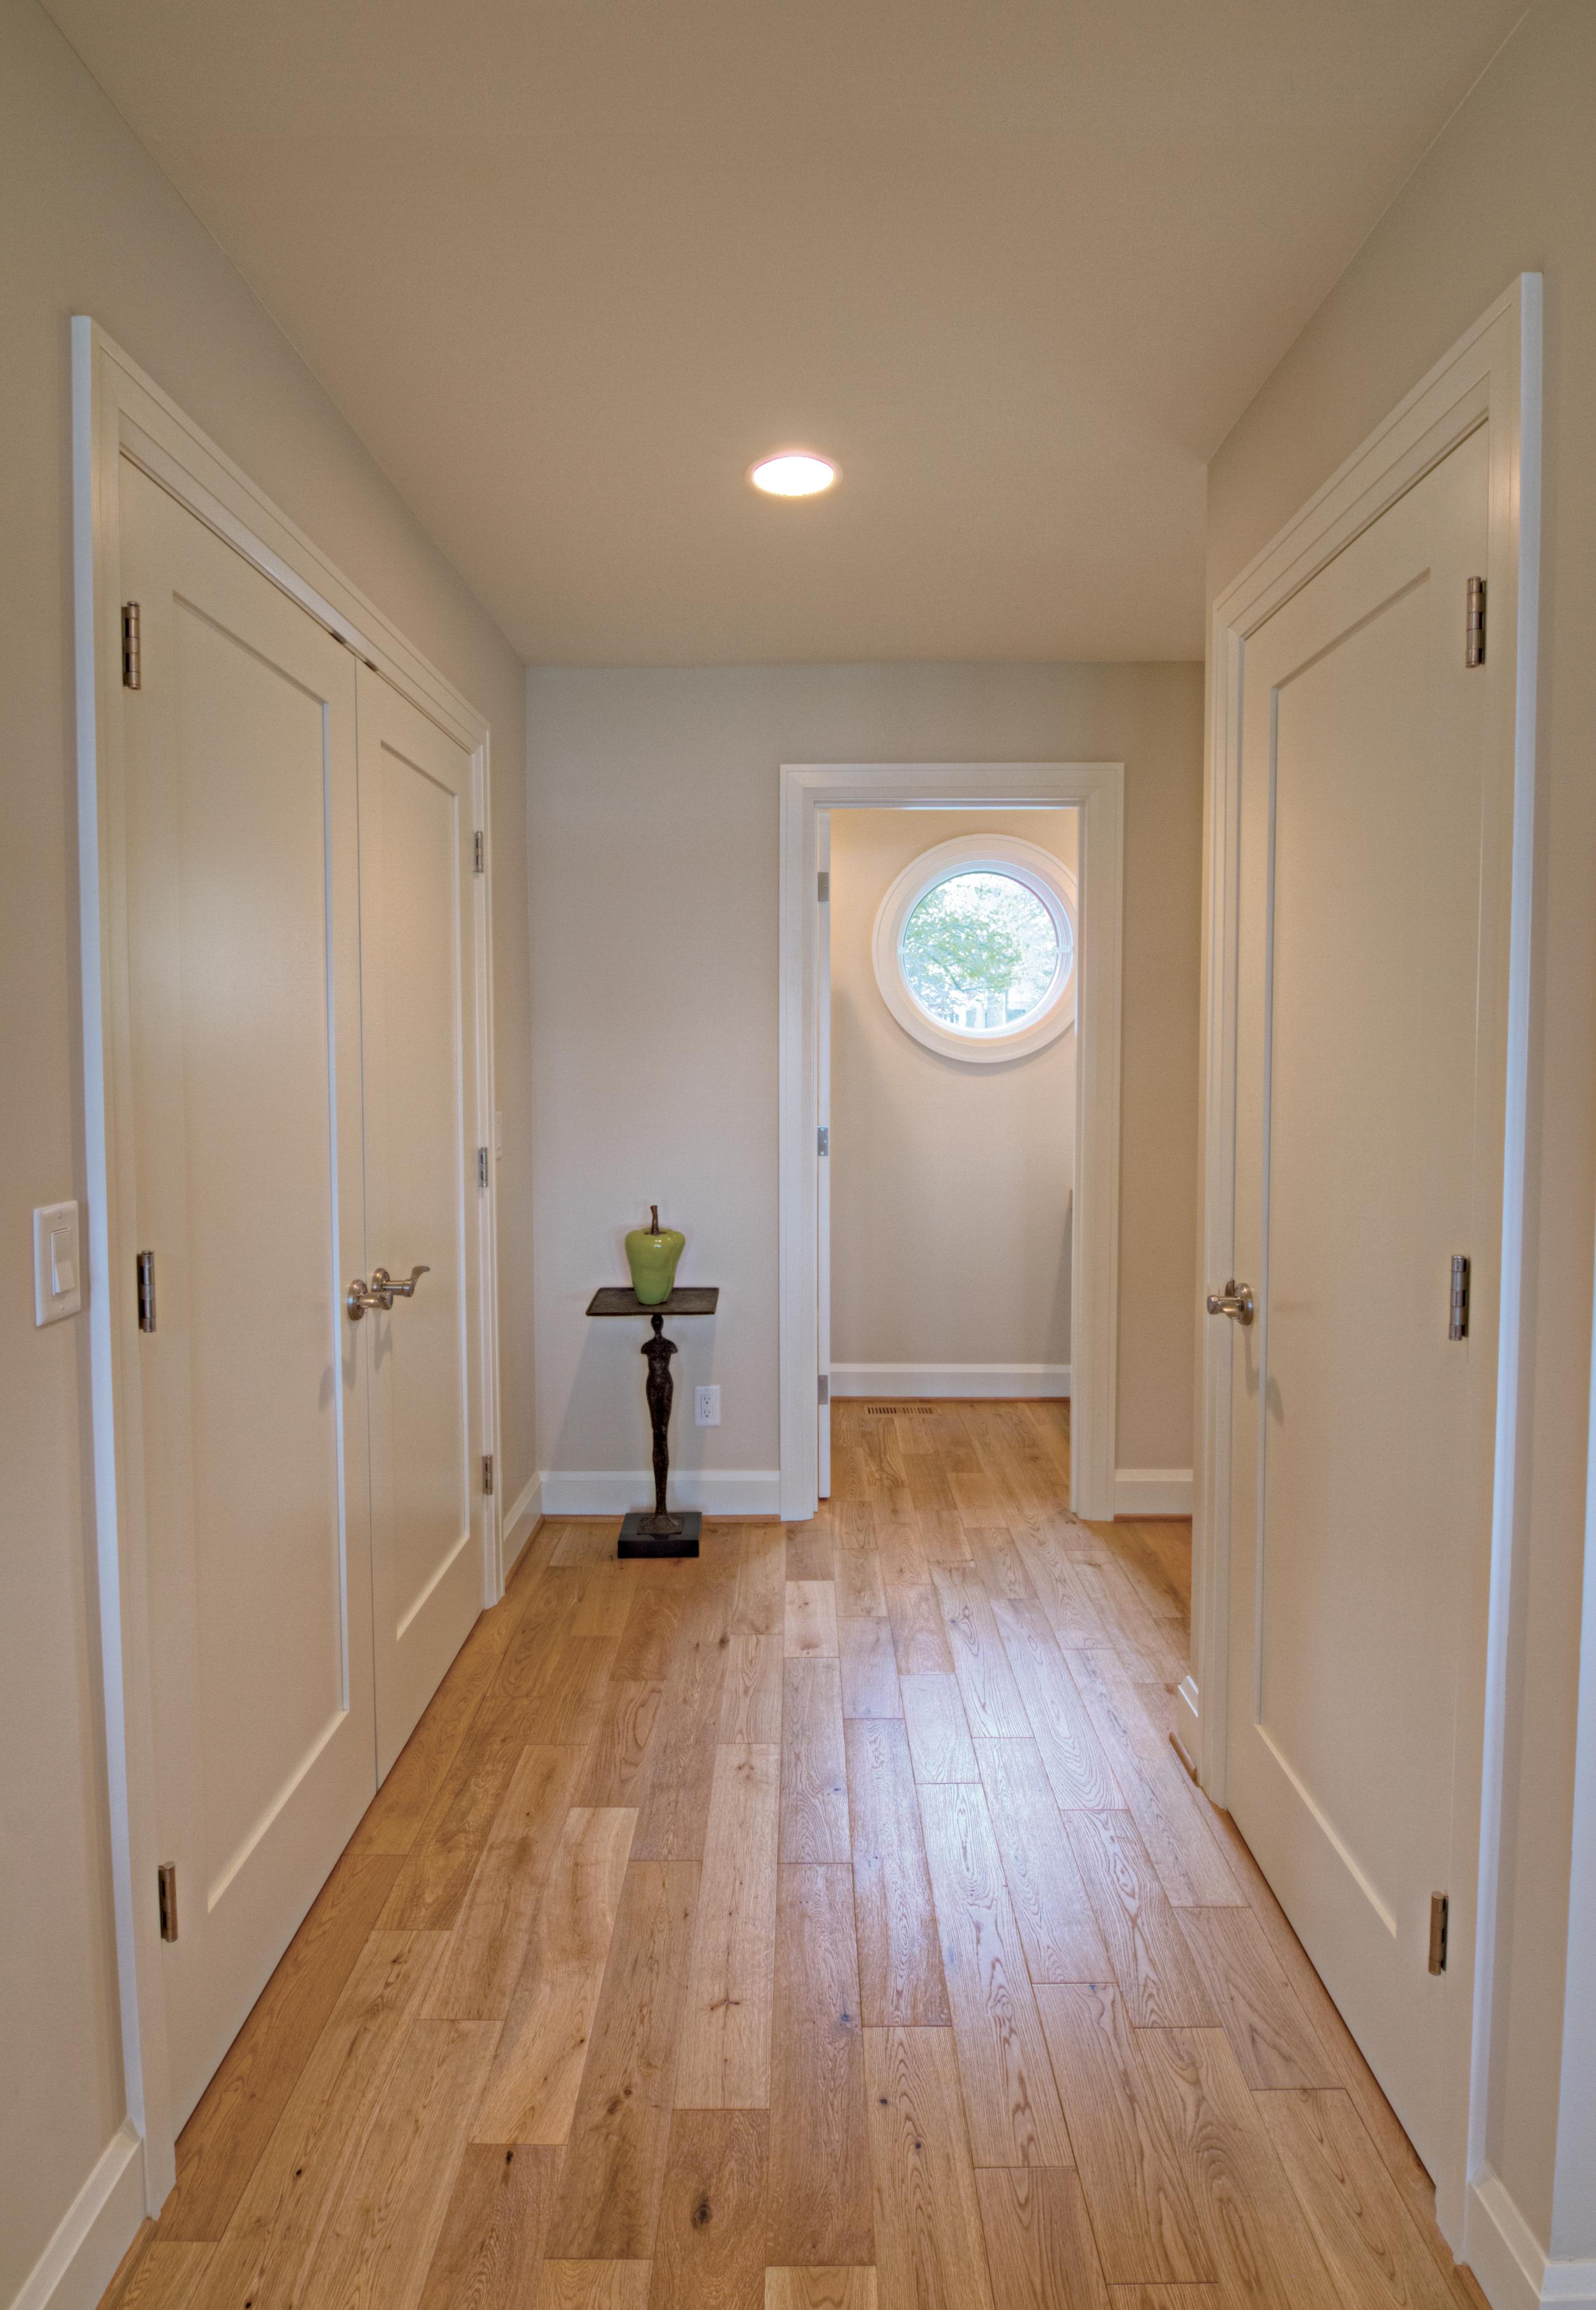 4_B Hallway HDR .jpg